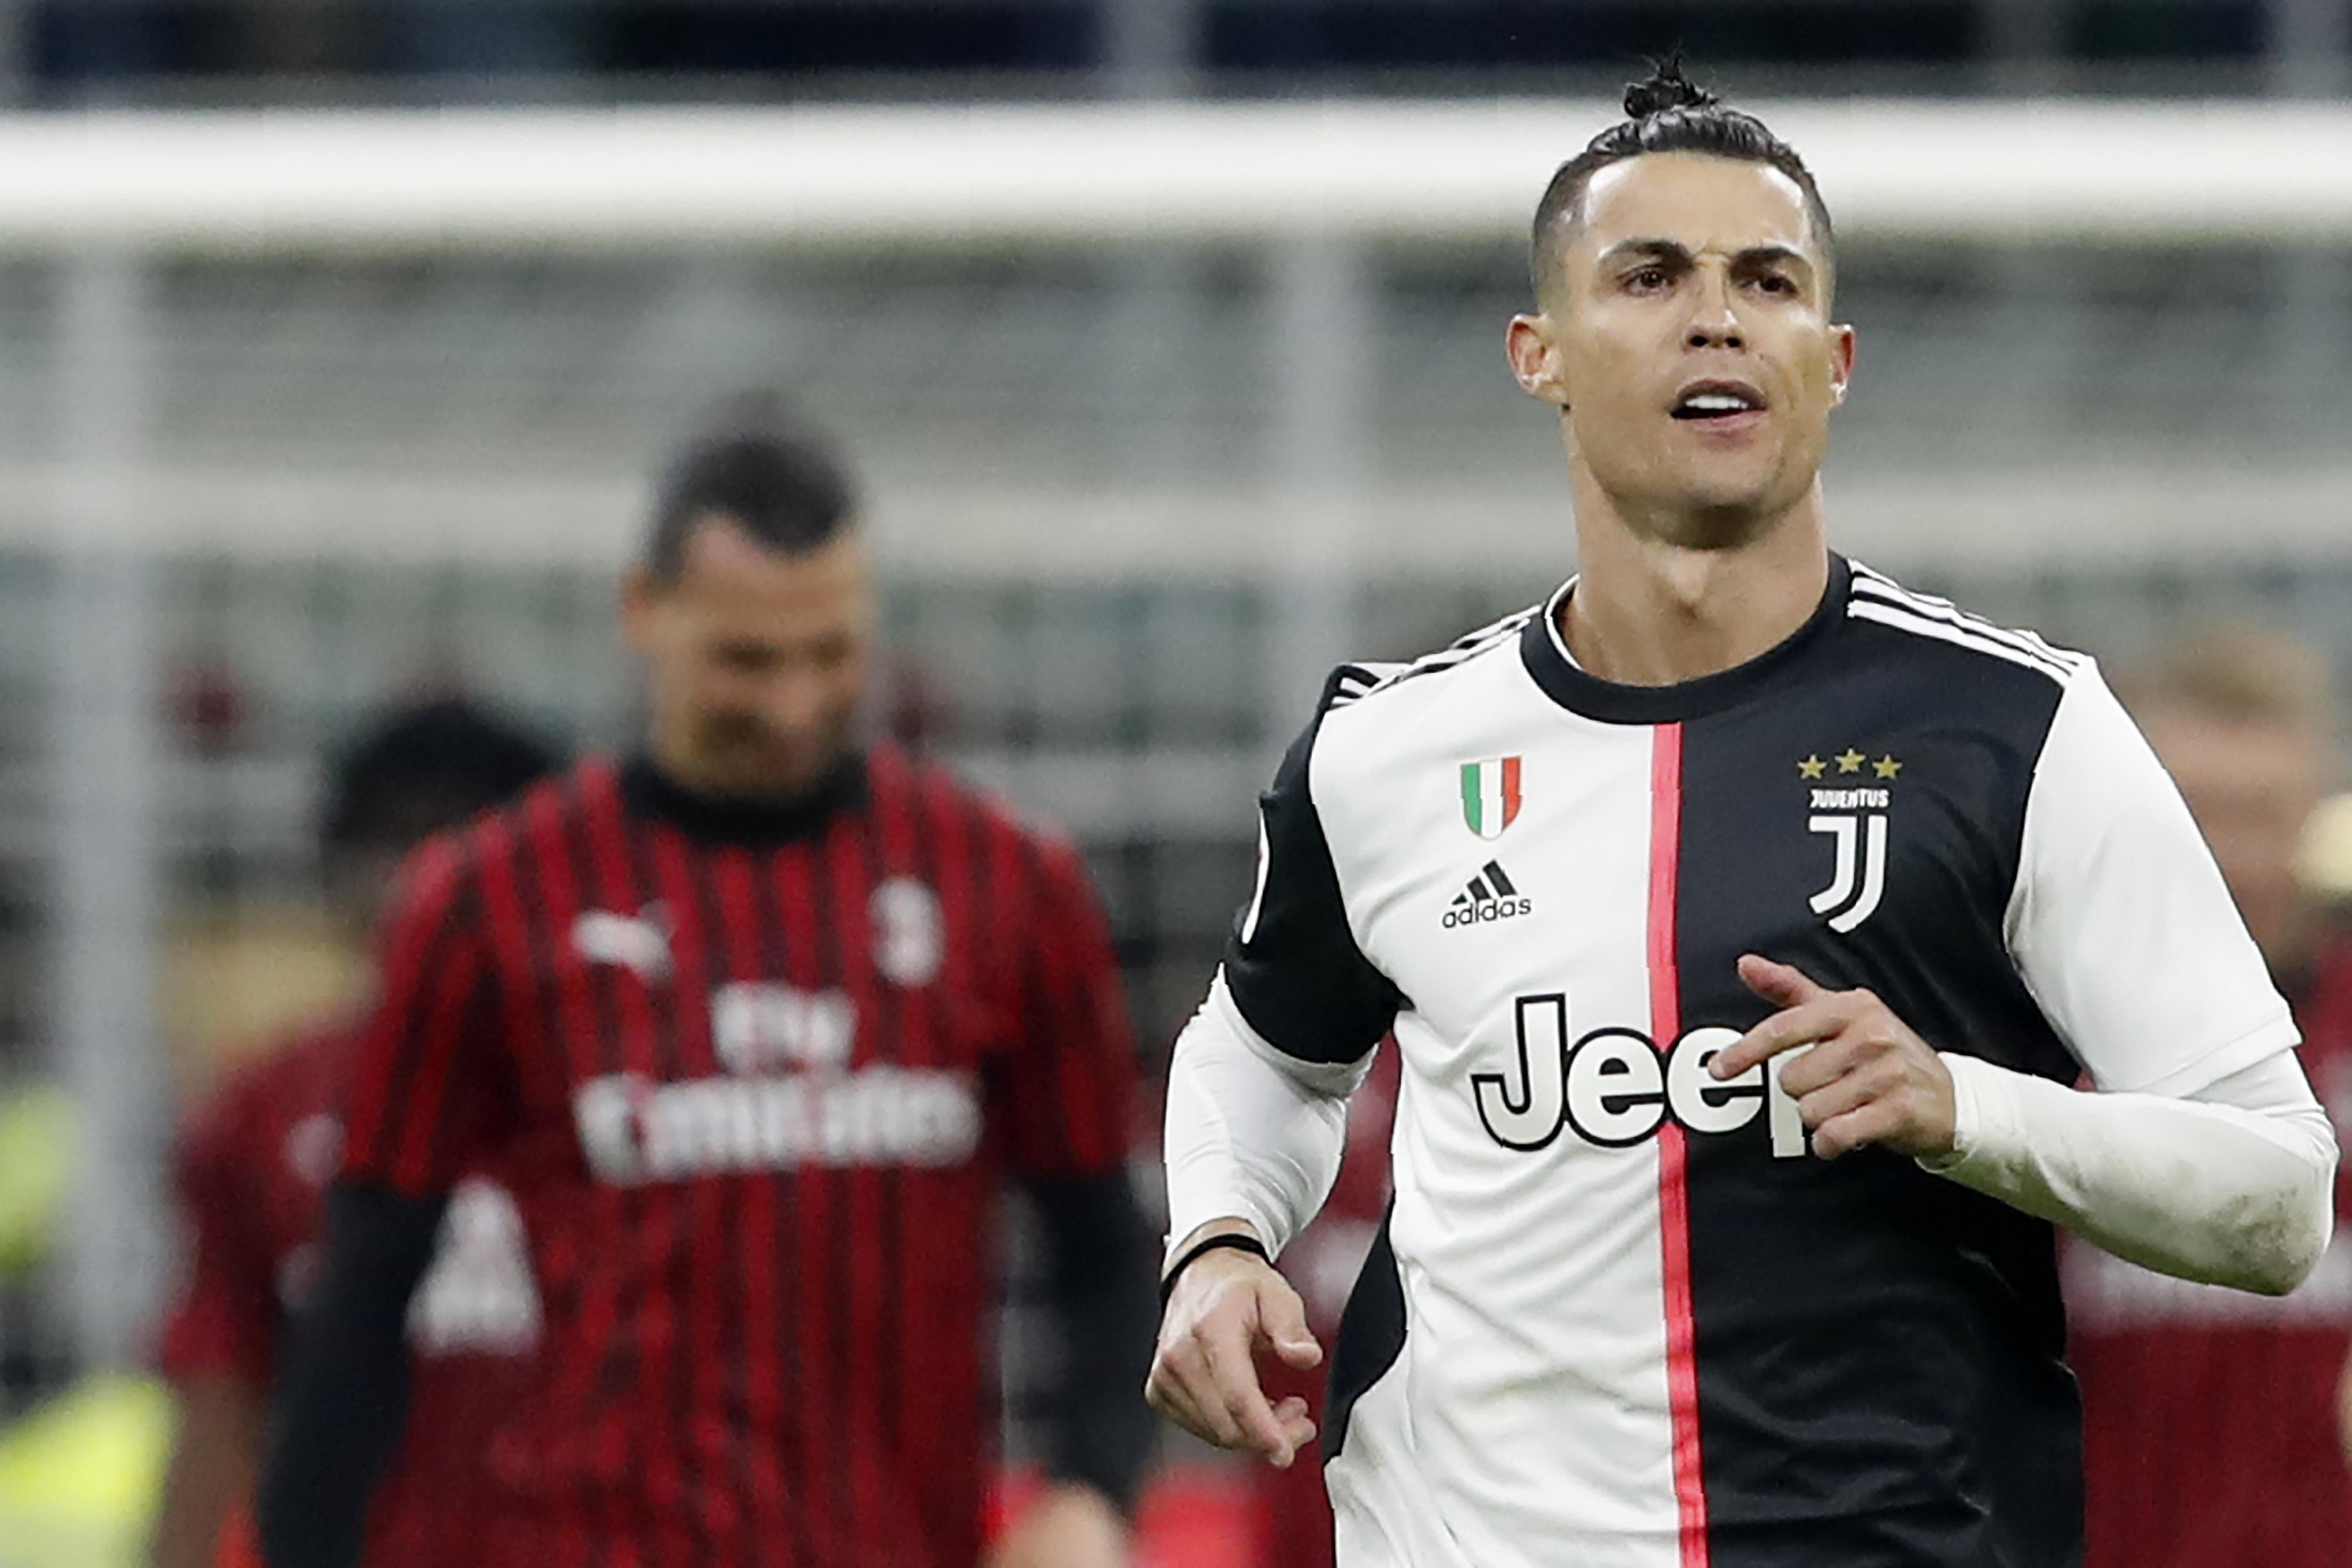 Juventus Vs Ac Milan Live Stream 6 12 20 Watch Cristiano Ronaldo Vs Zlatan Ibrahimovic In Coppa Di Italia Semifinal Leg 2 Online Time Usa Tv Channel Nj Com